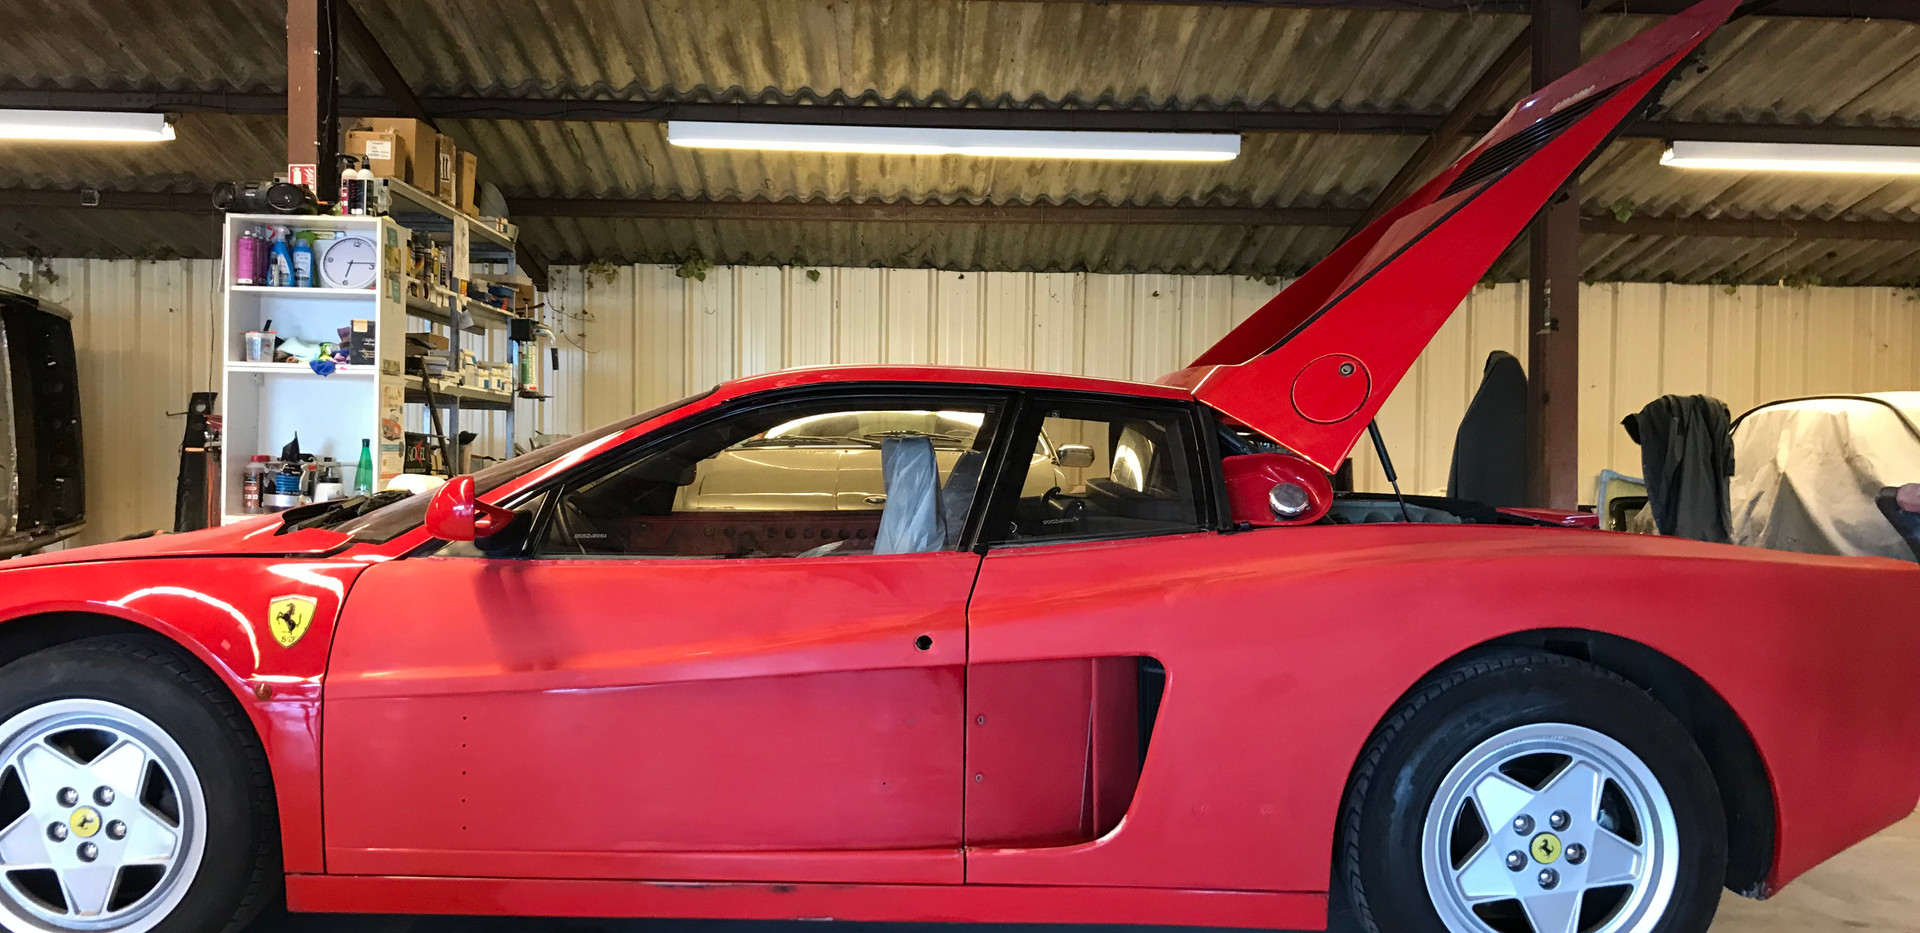 12 - Ferrari testarossa septembre-octobr